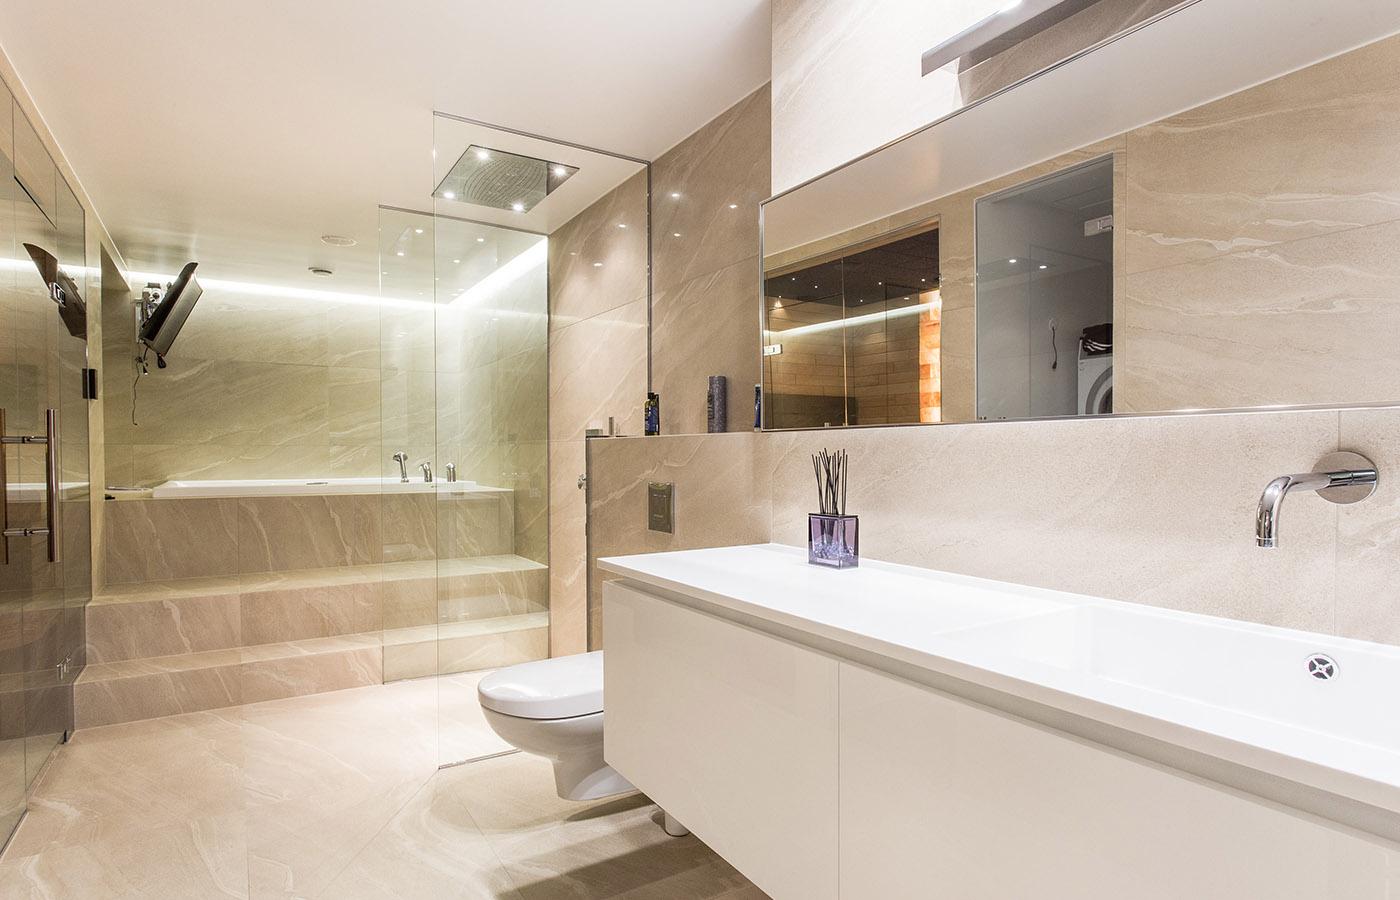 terraced house bathroom_aet piel design